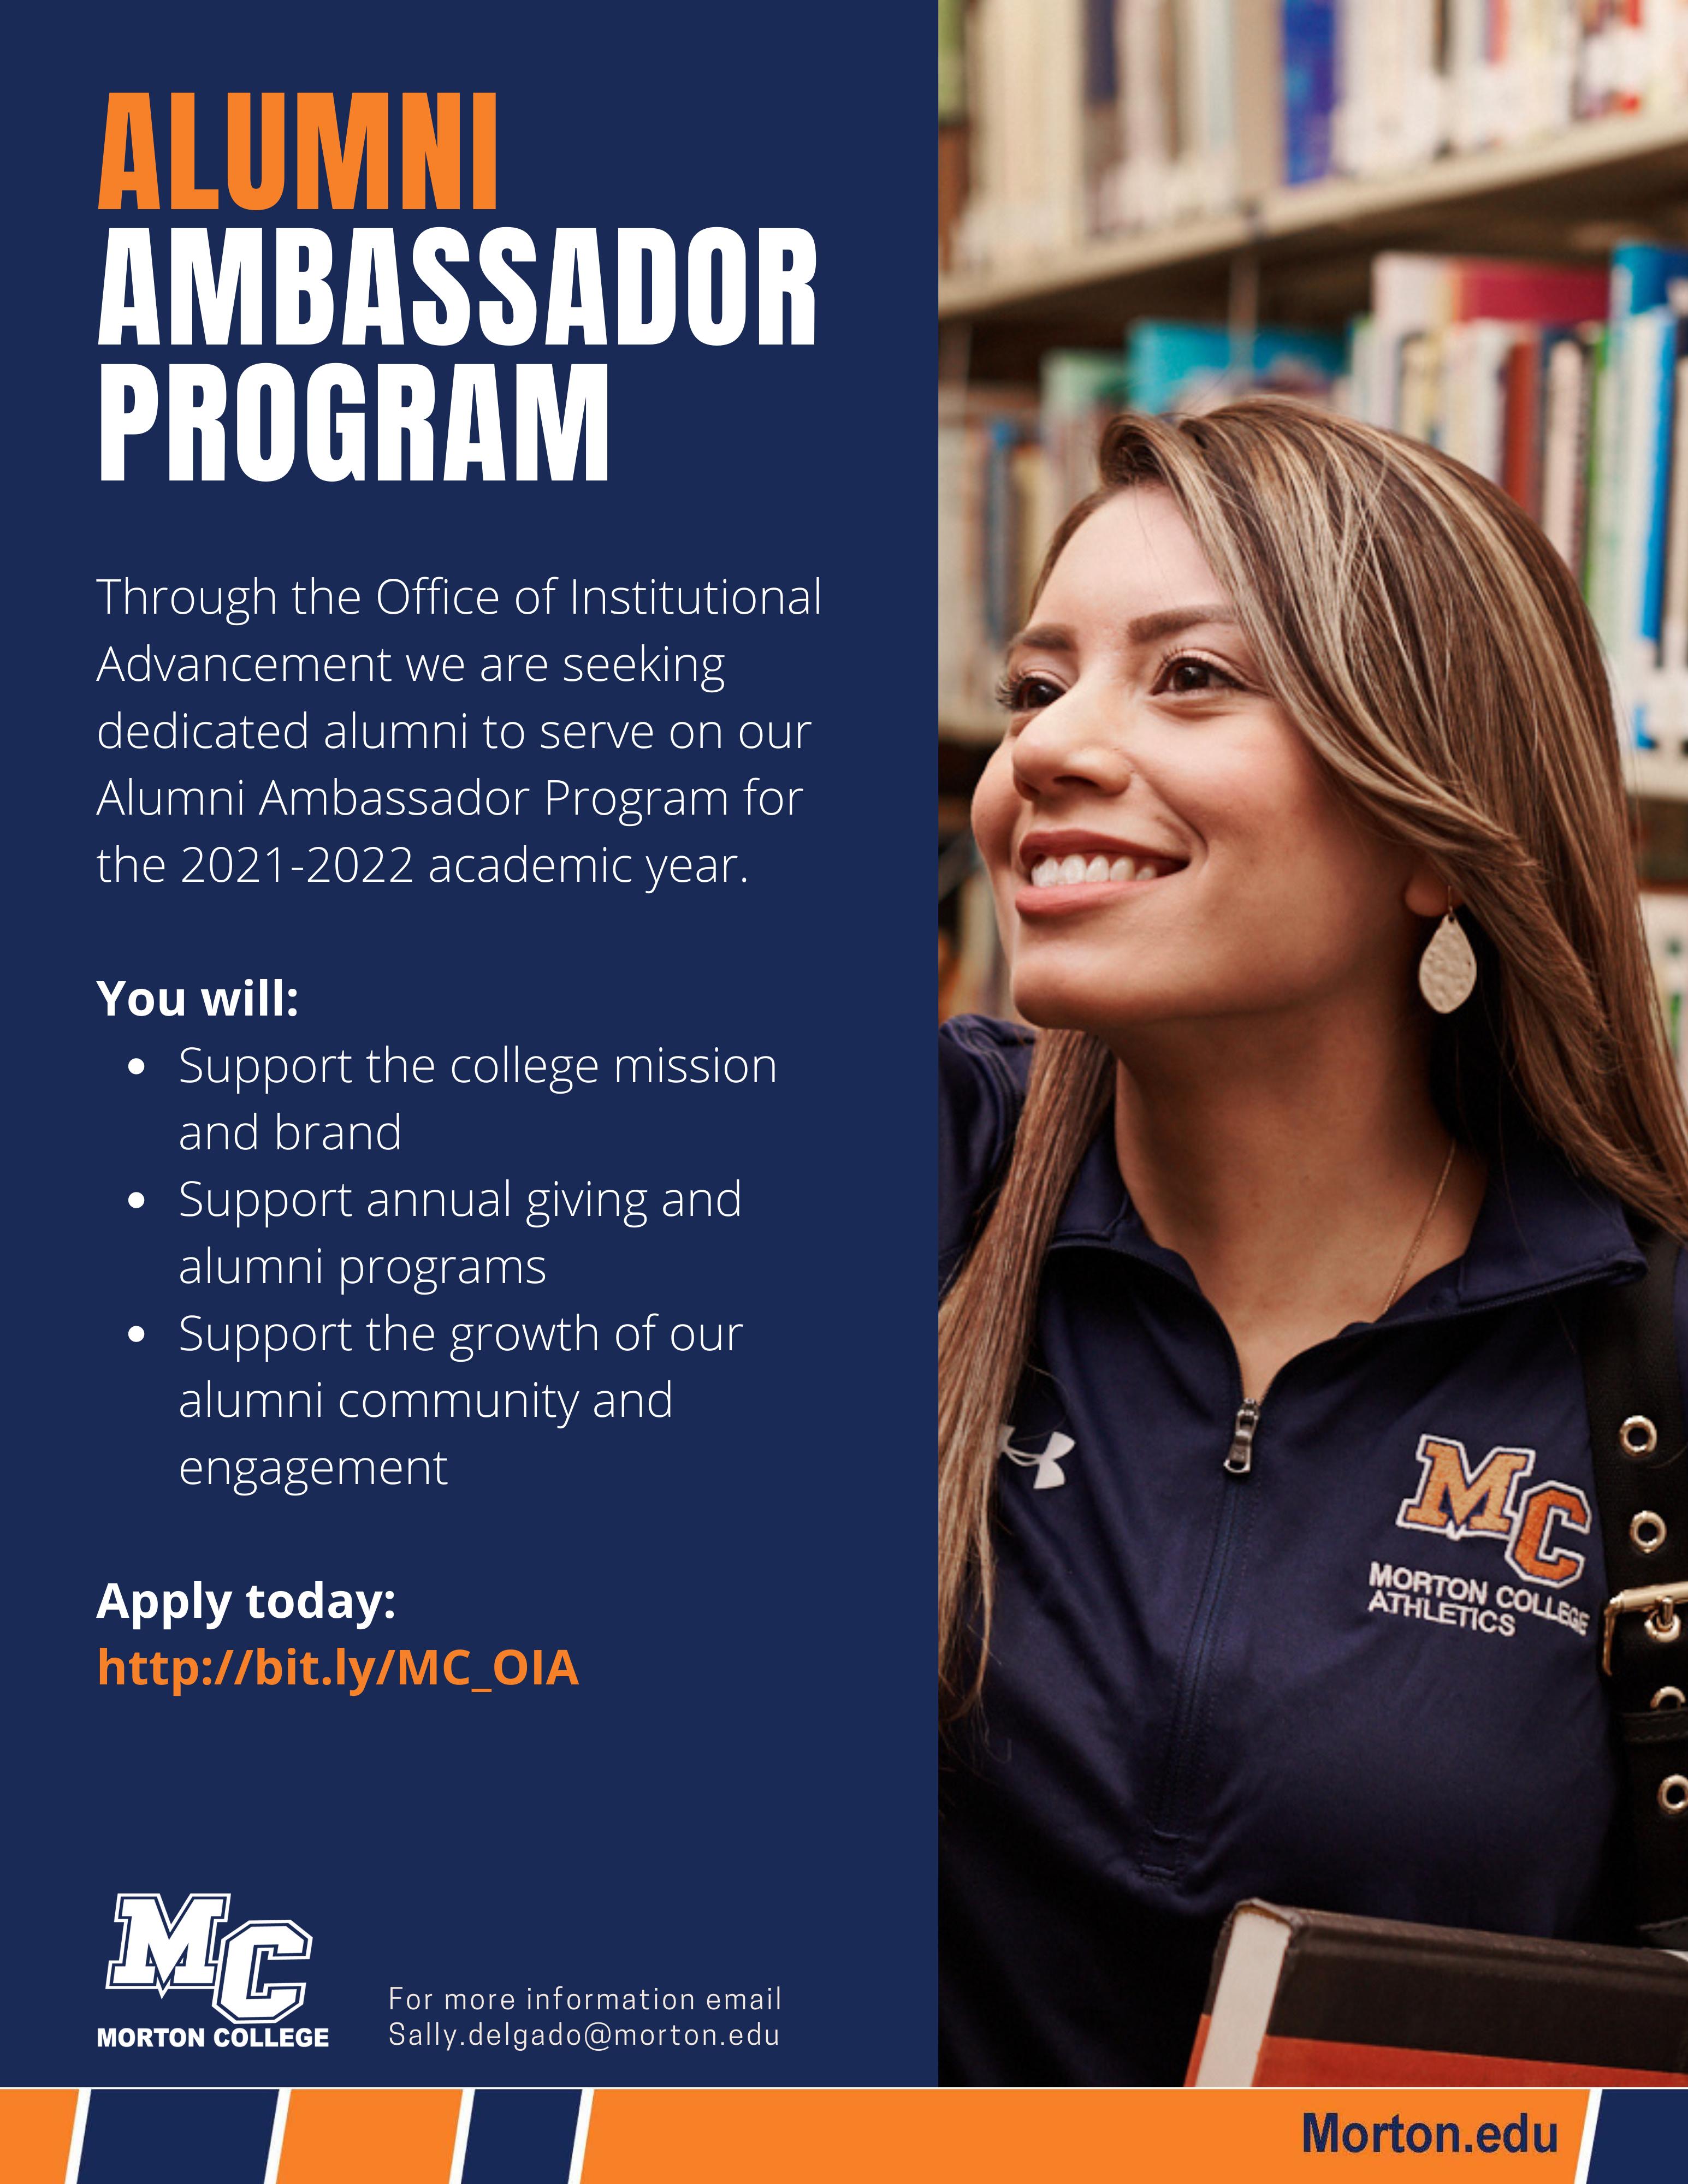 Alumni Ambassador Program (3)